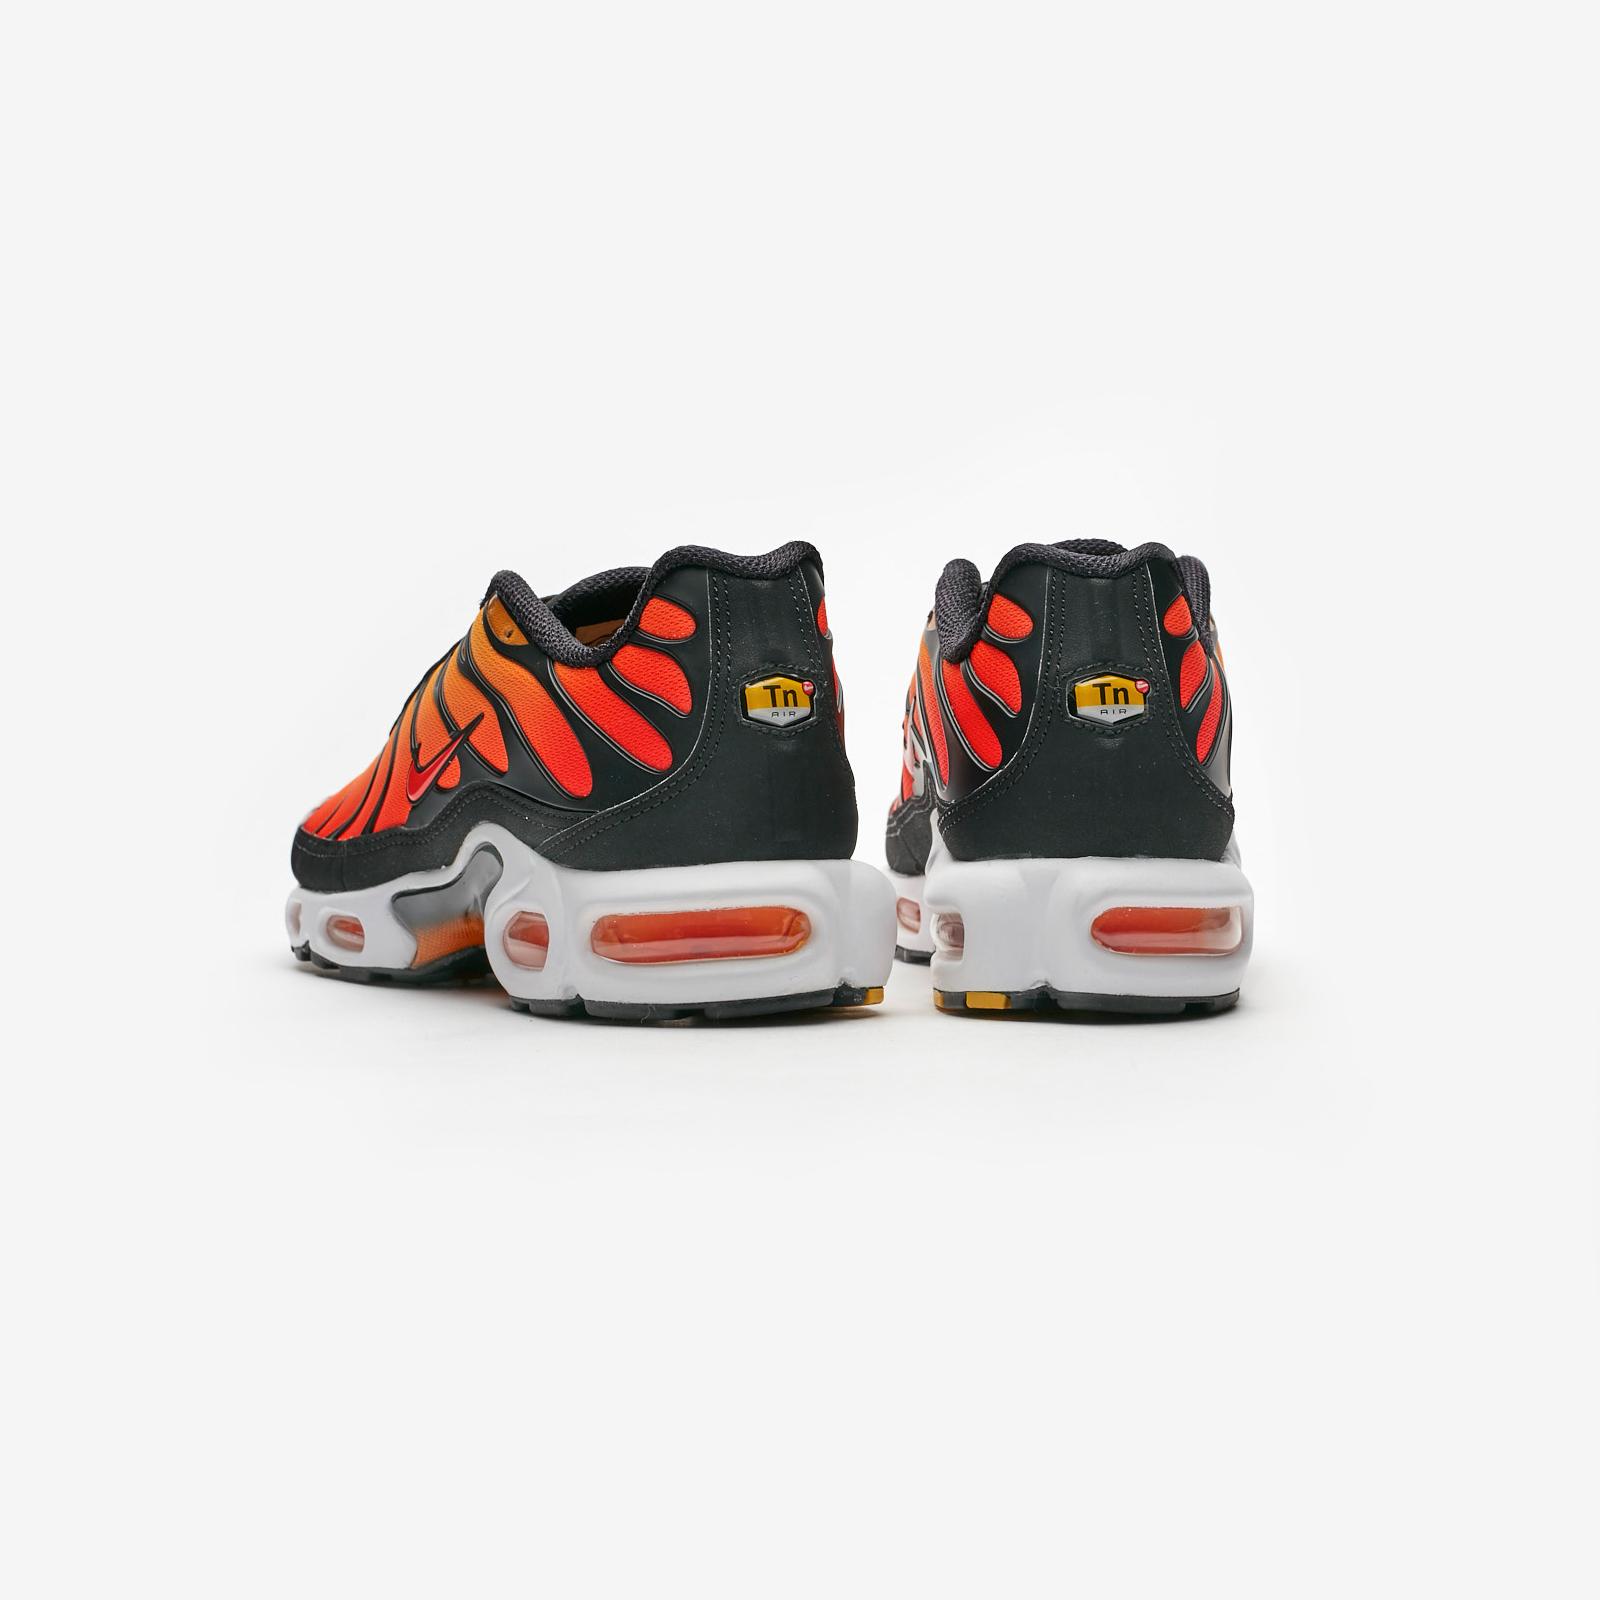 Nike Air Max Plus OG Bq4629 001 Sneakersnstuff I